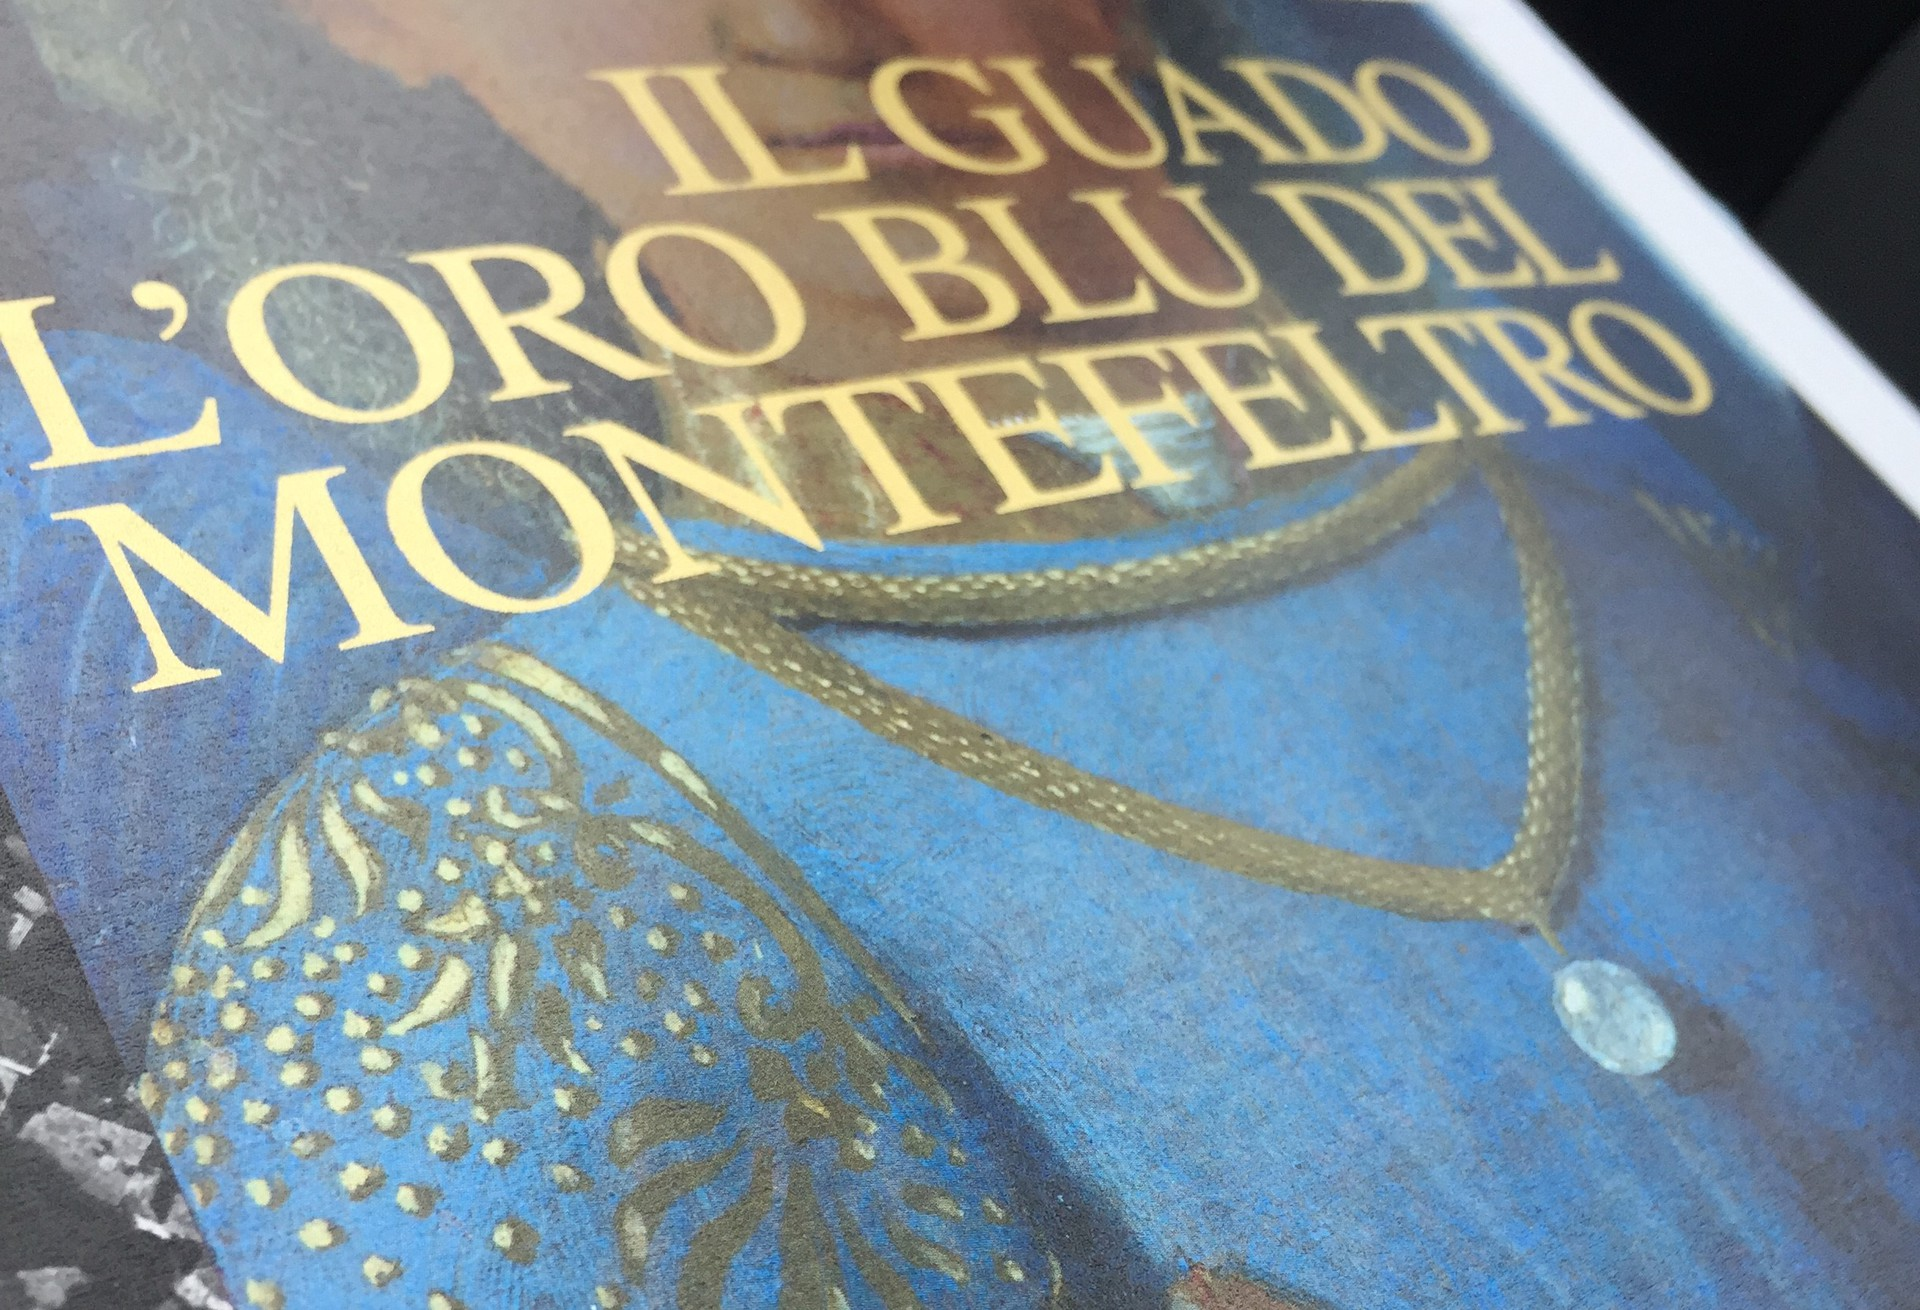 guado-urbino-weavers-and-fabric-decorators-urbino-pesaro-e-urbino-thumbnail